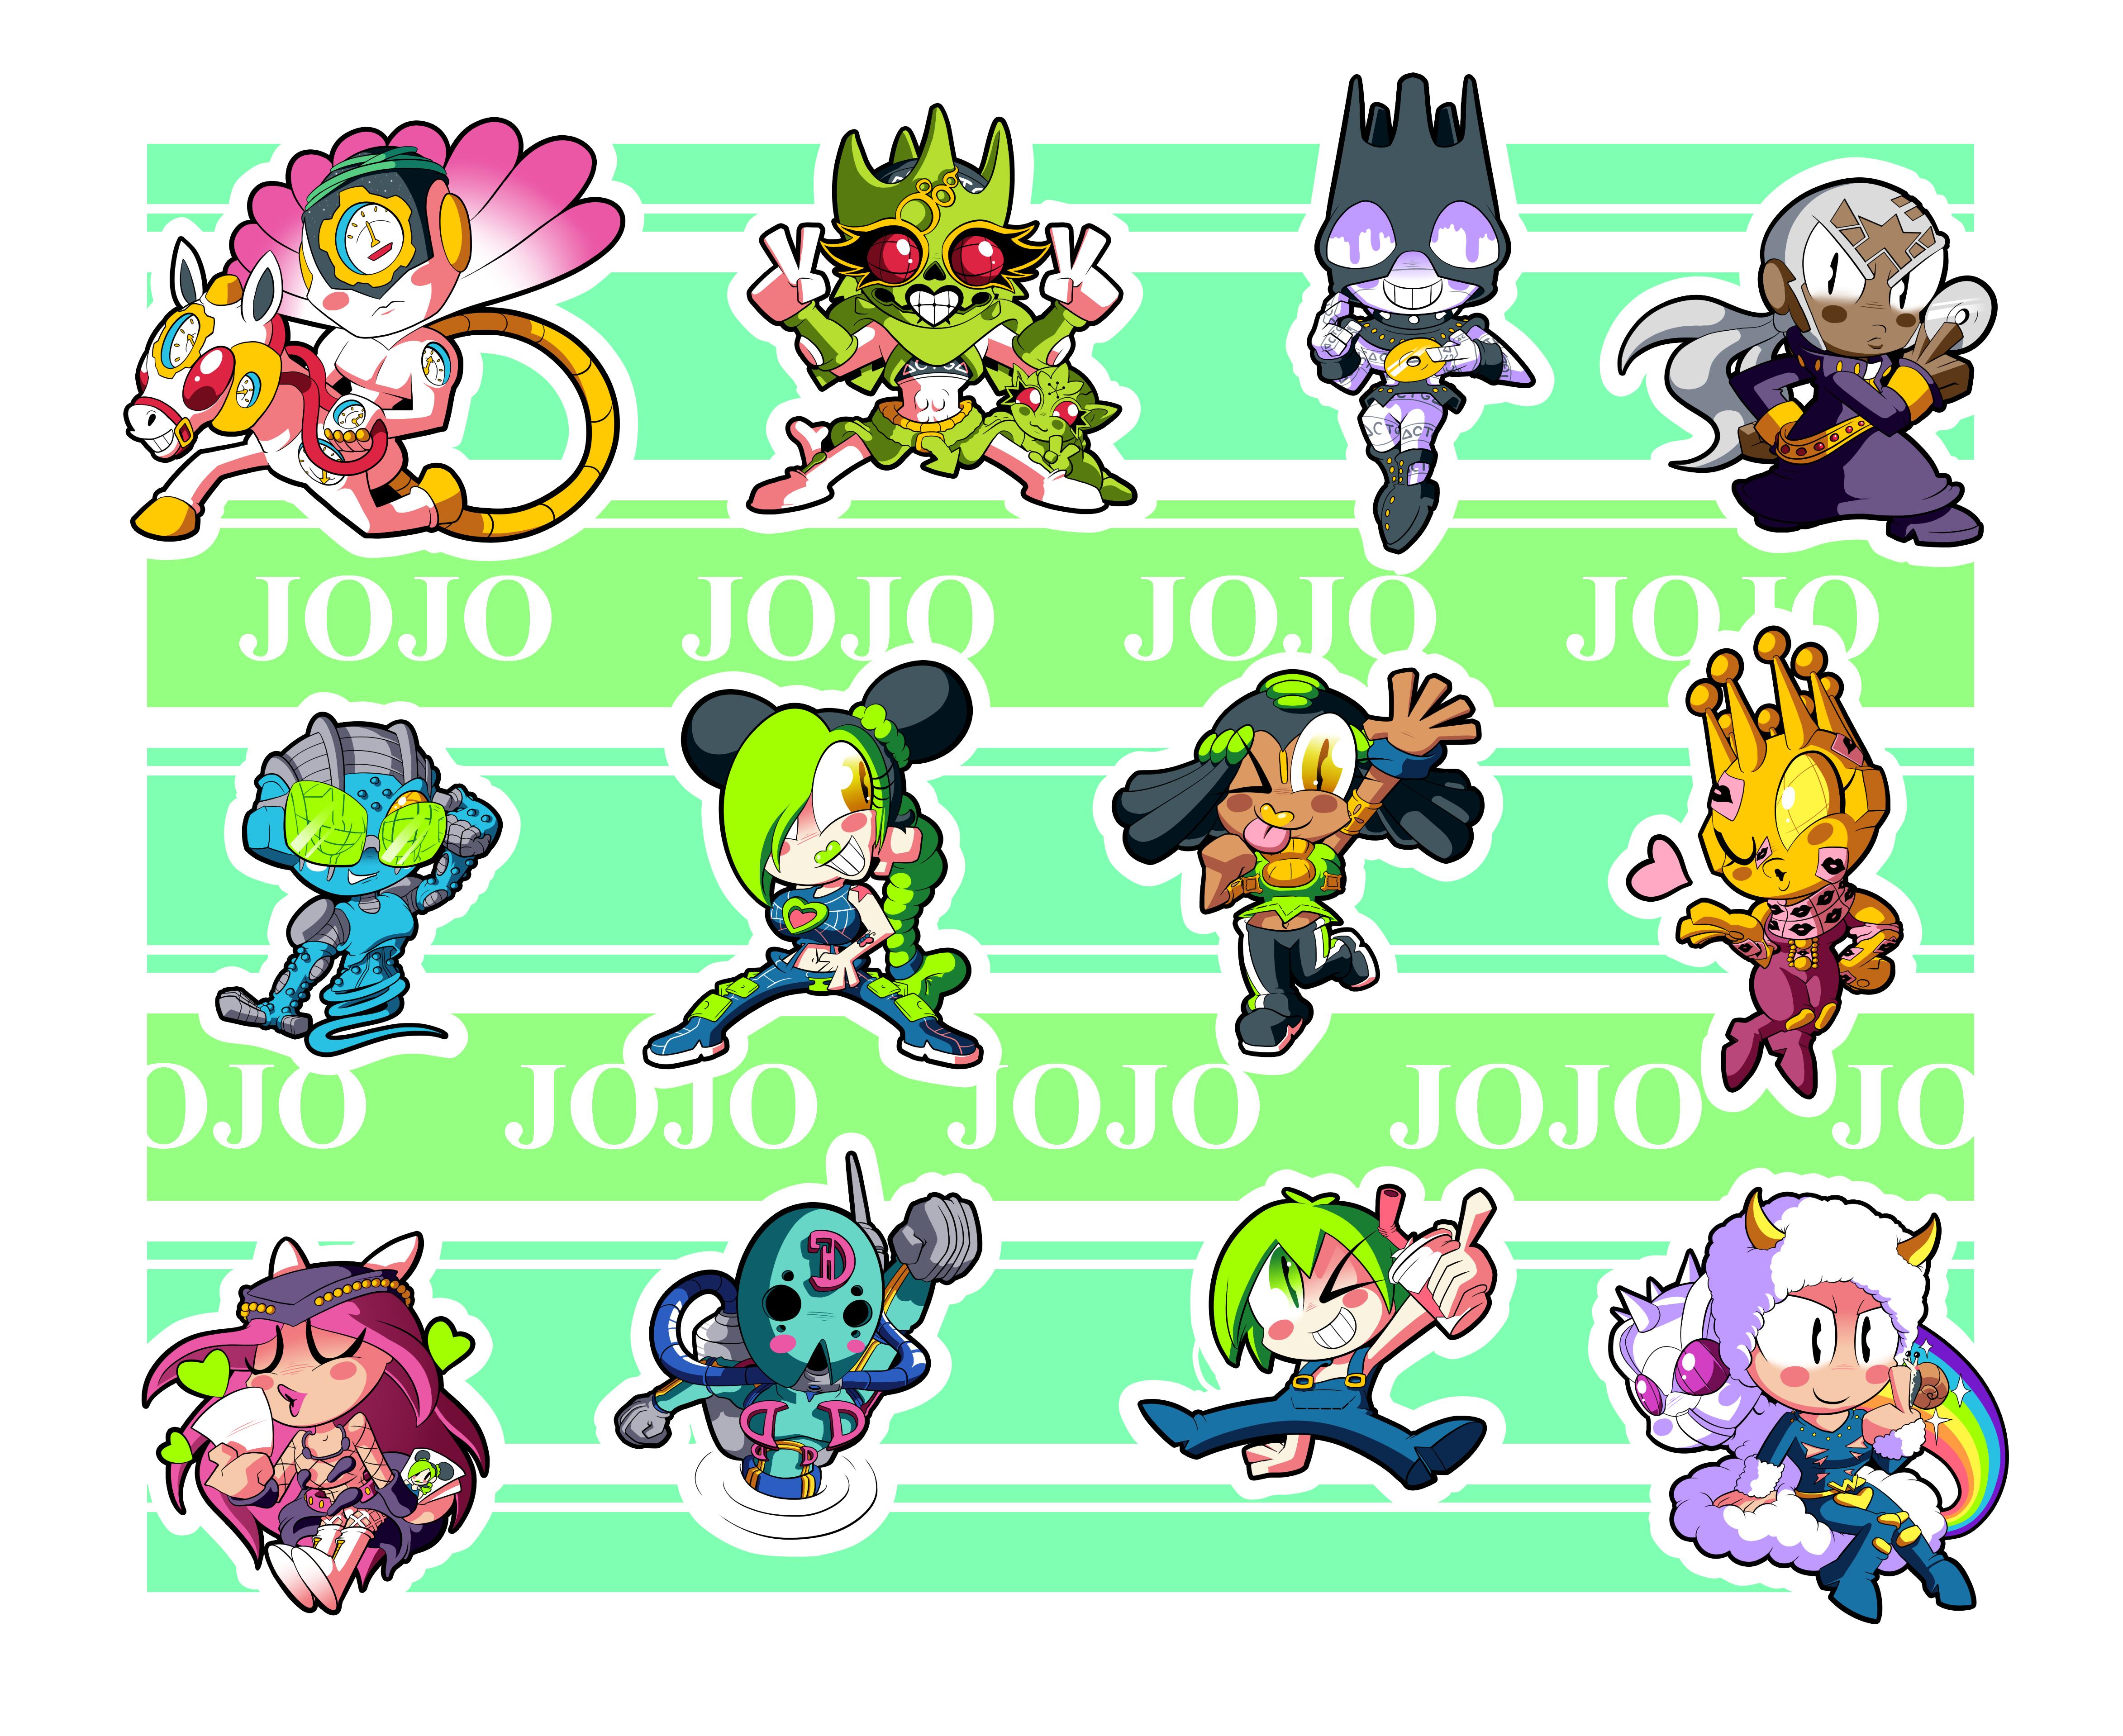 Jojo Part 6 Chibis